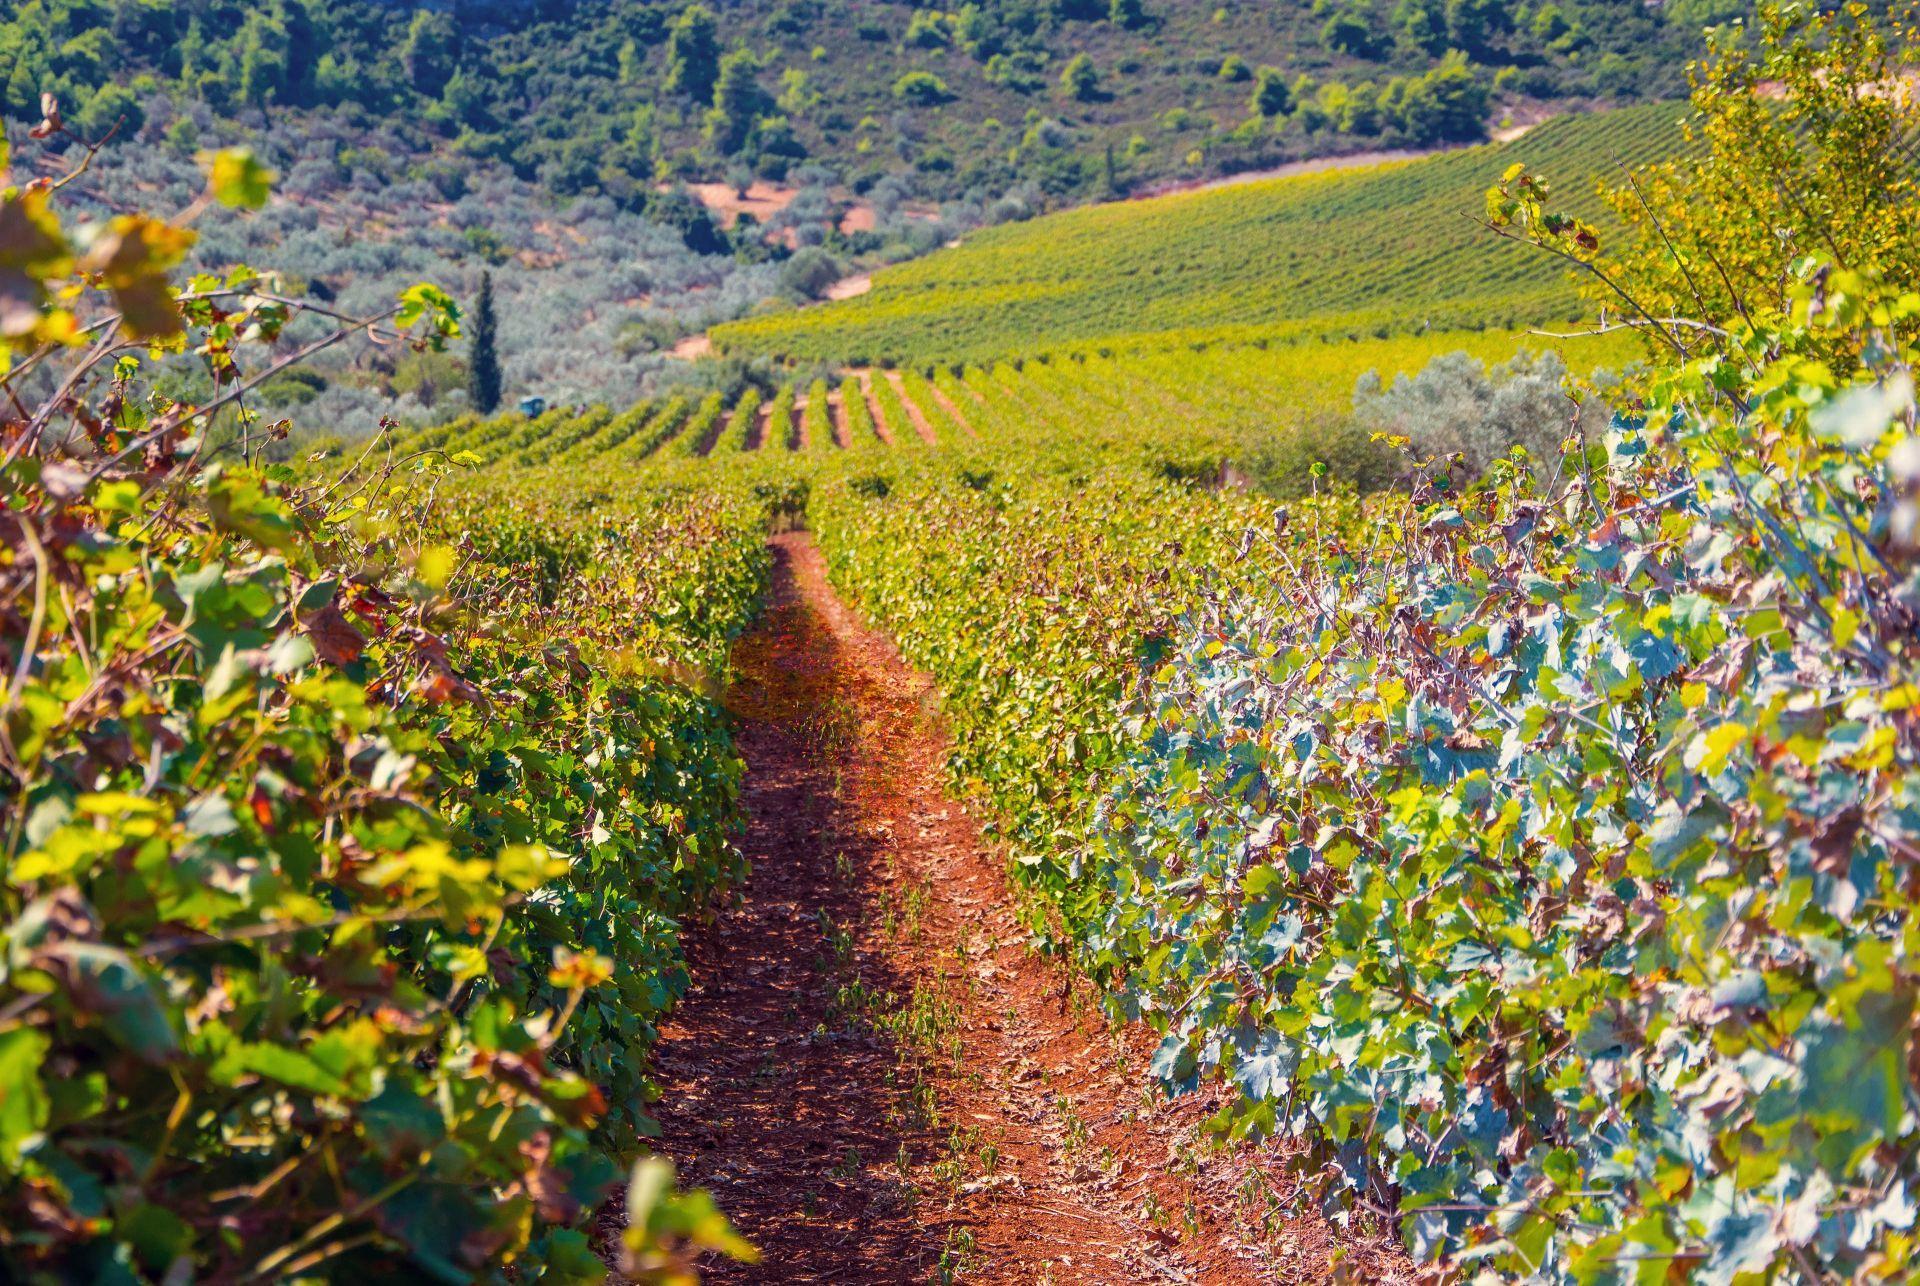 Wineries in Gythio